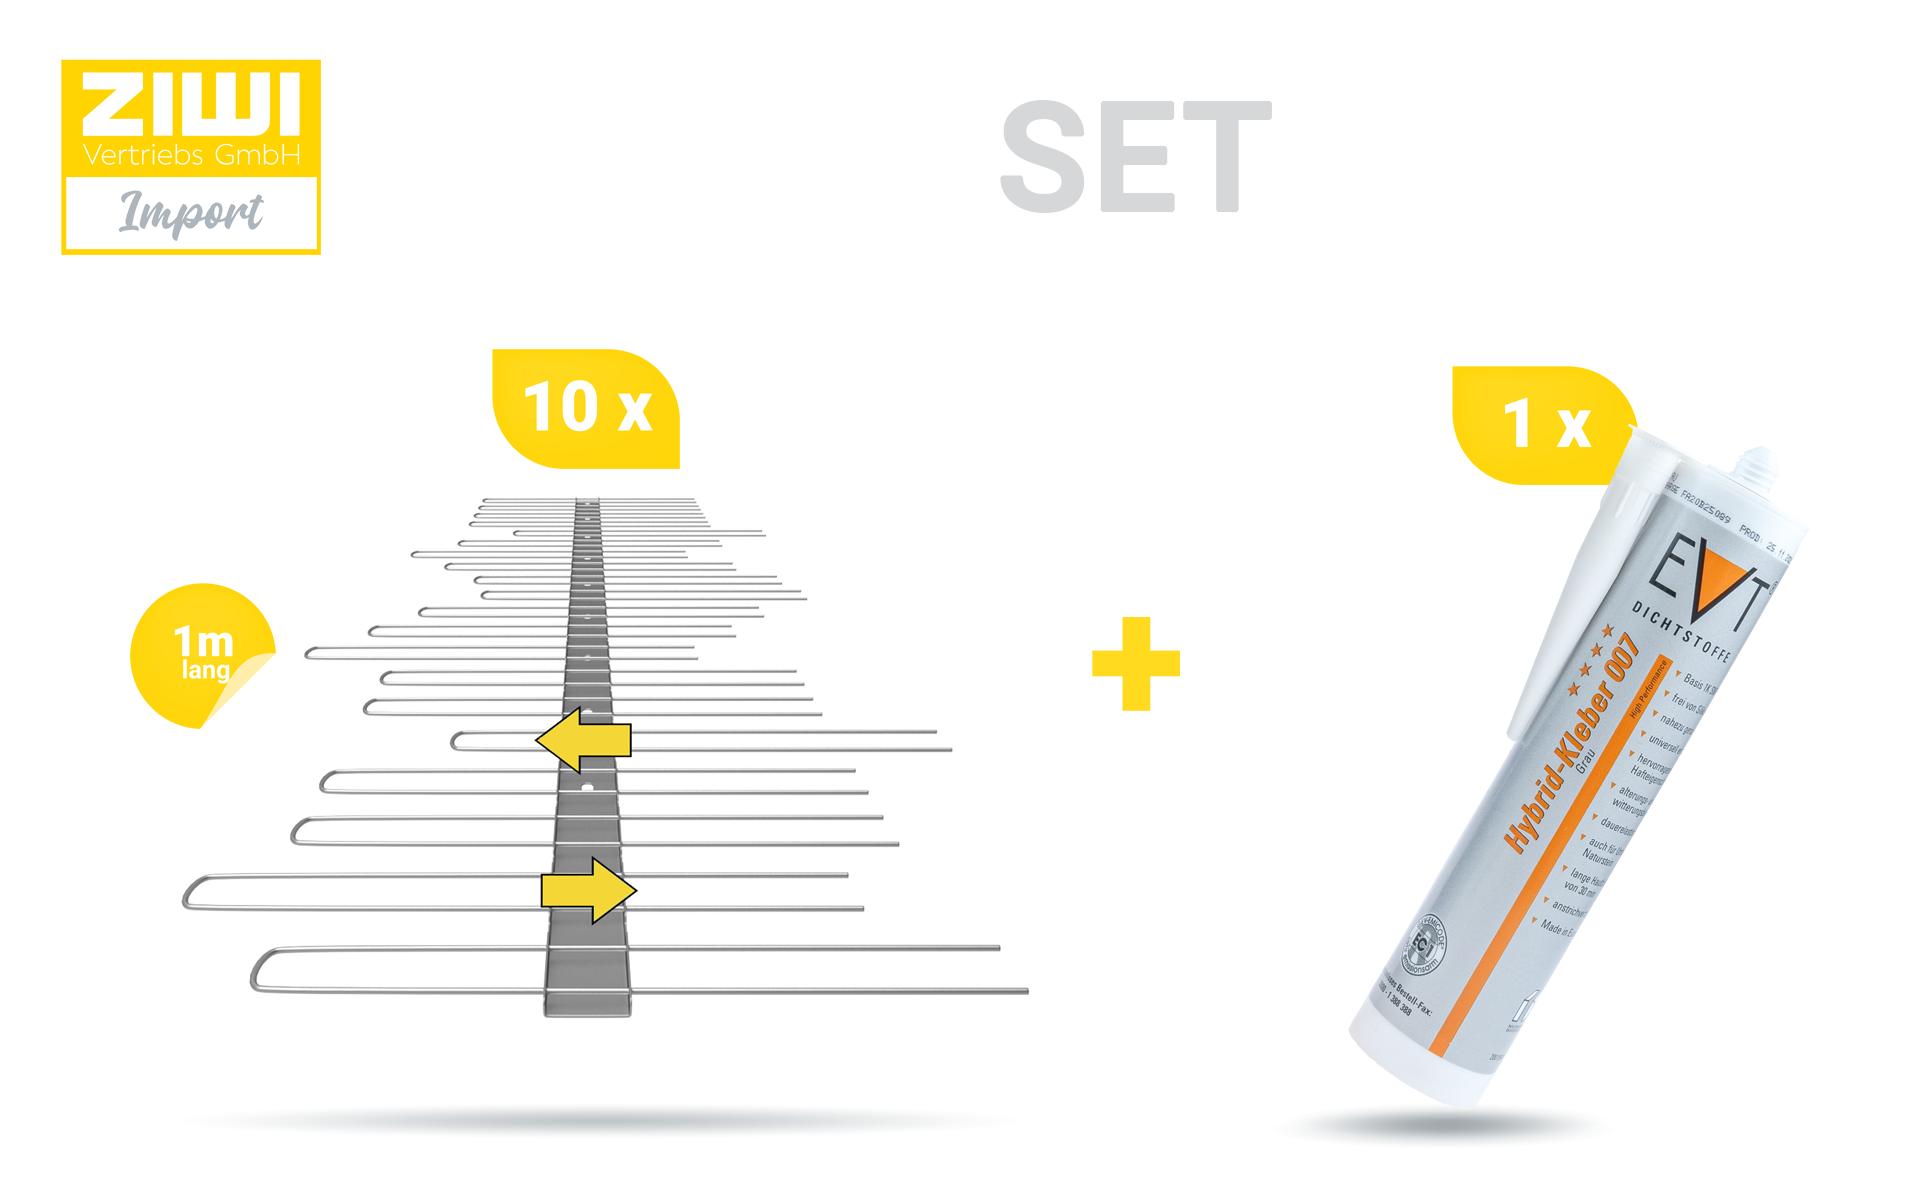 TAS 1er Solarspikes aus Edelstahl 10 Stück 1 m lang und 1 Stück Hybrid Kleber - SET